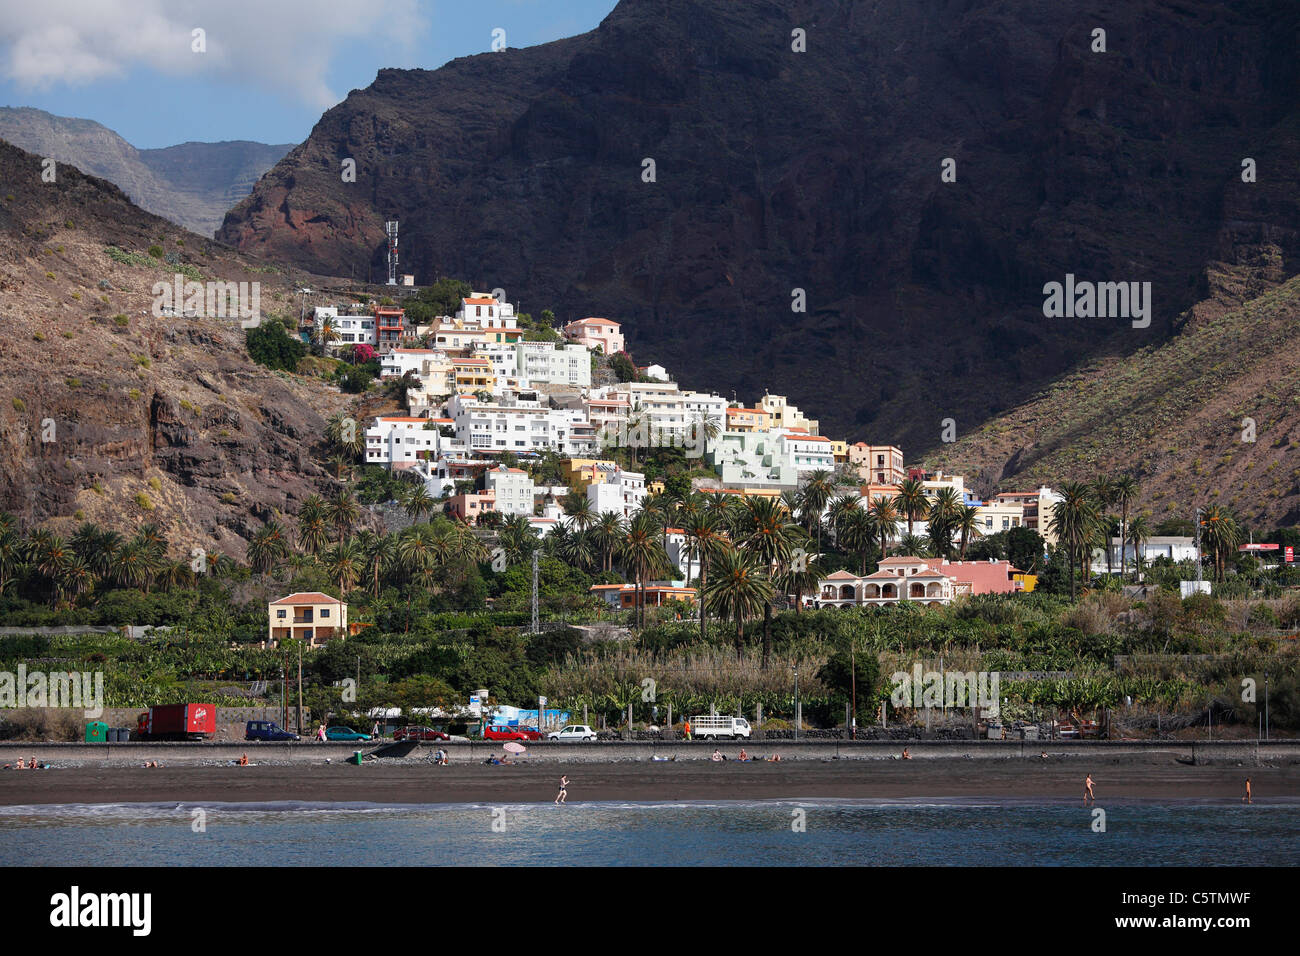 Spain, Canary Islands, La Gomera, Valle Gran Rey, La Calera, Tourist on beach with mountains - Stock Image